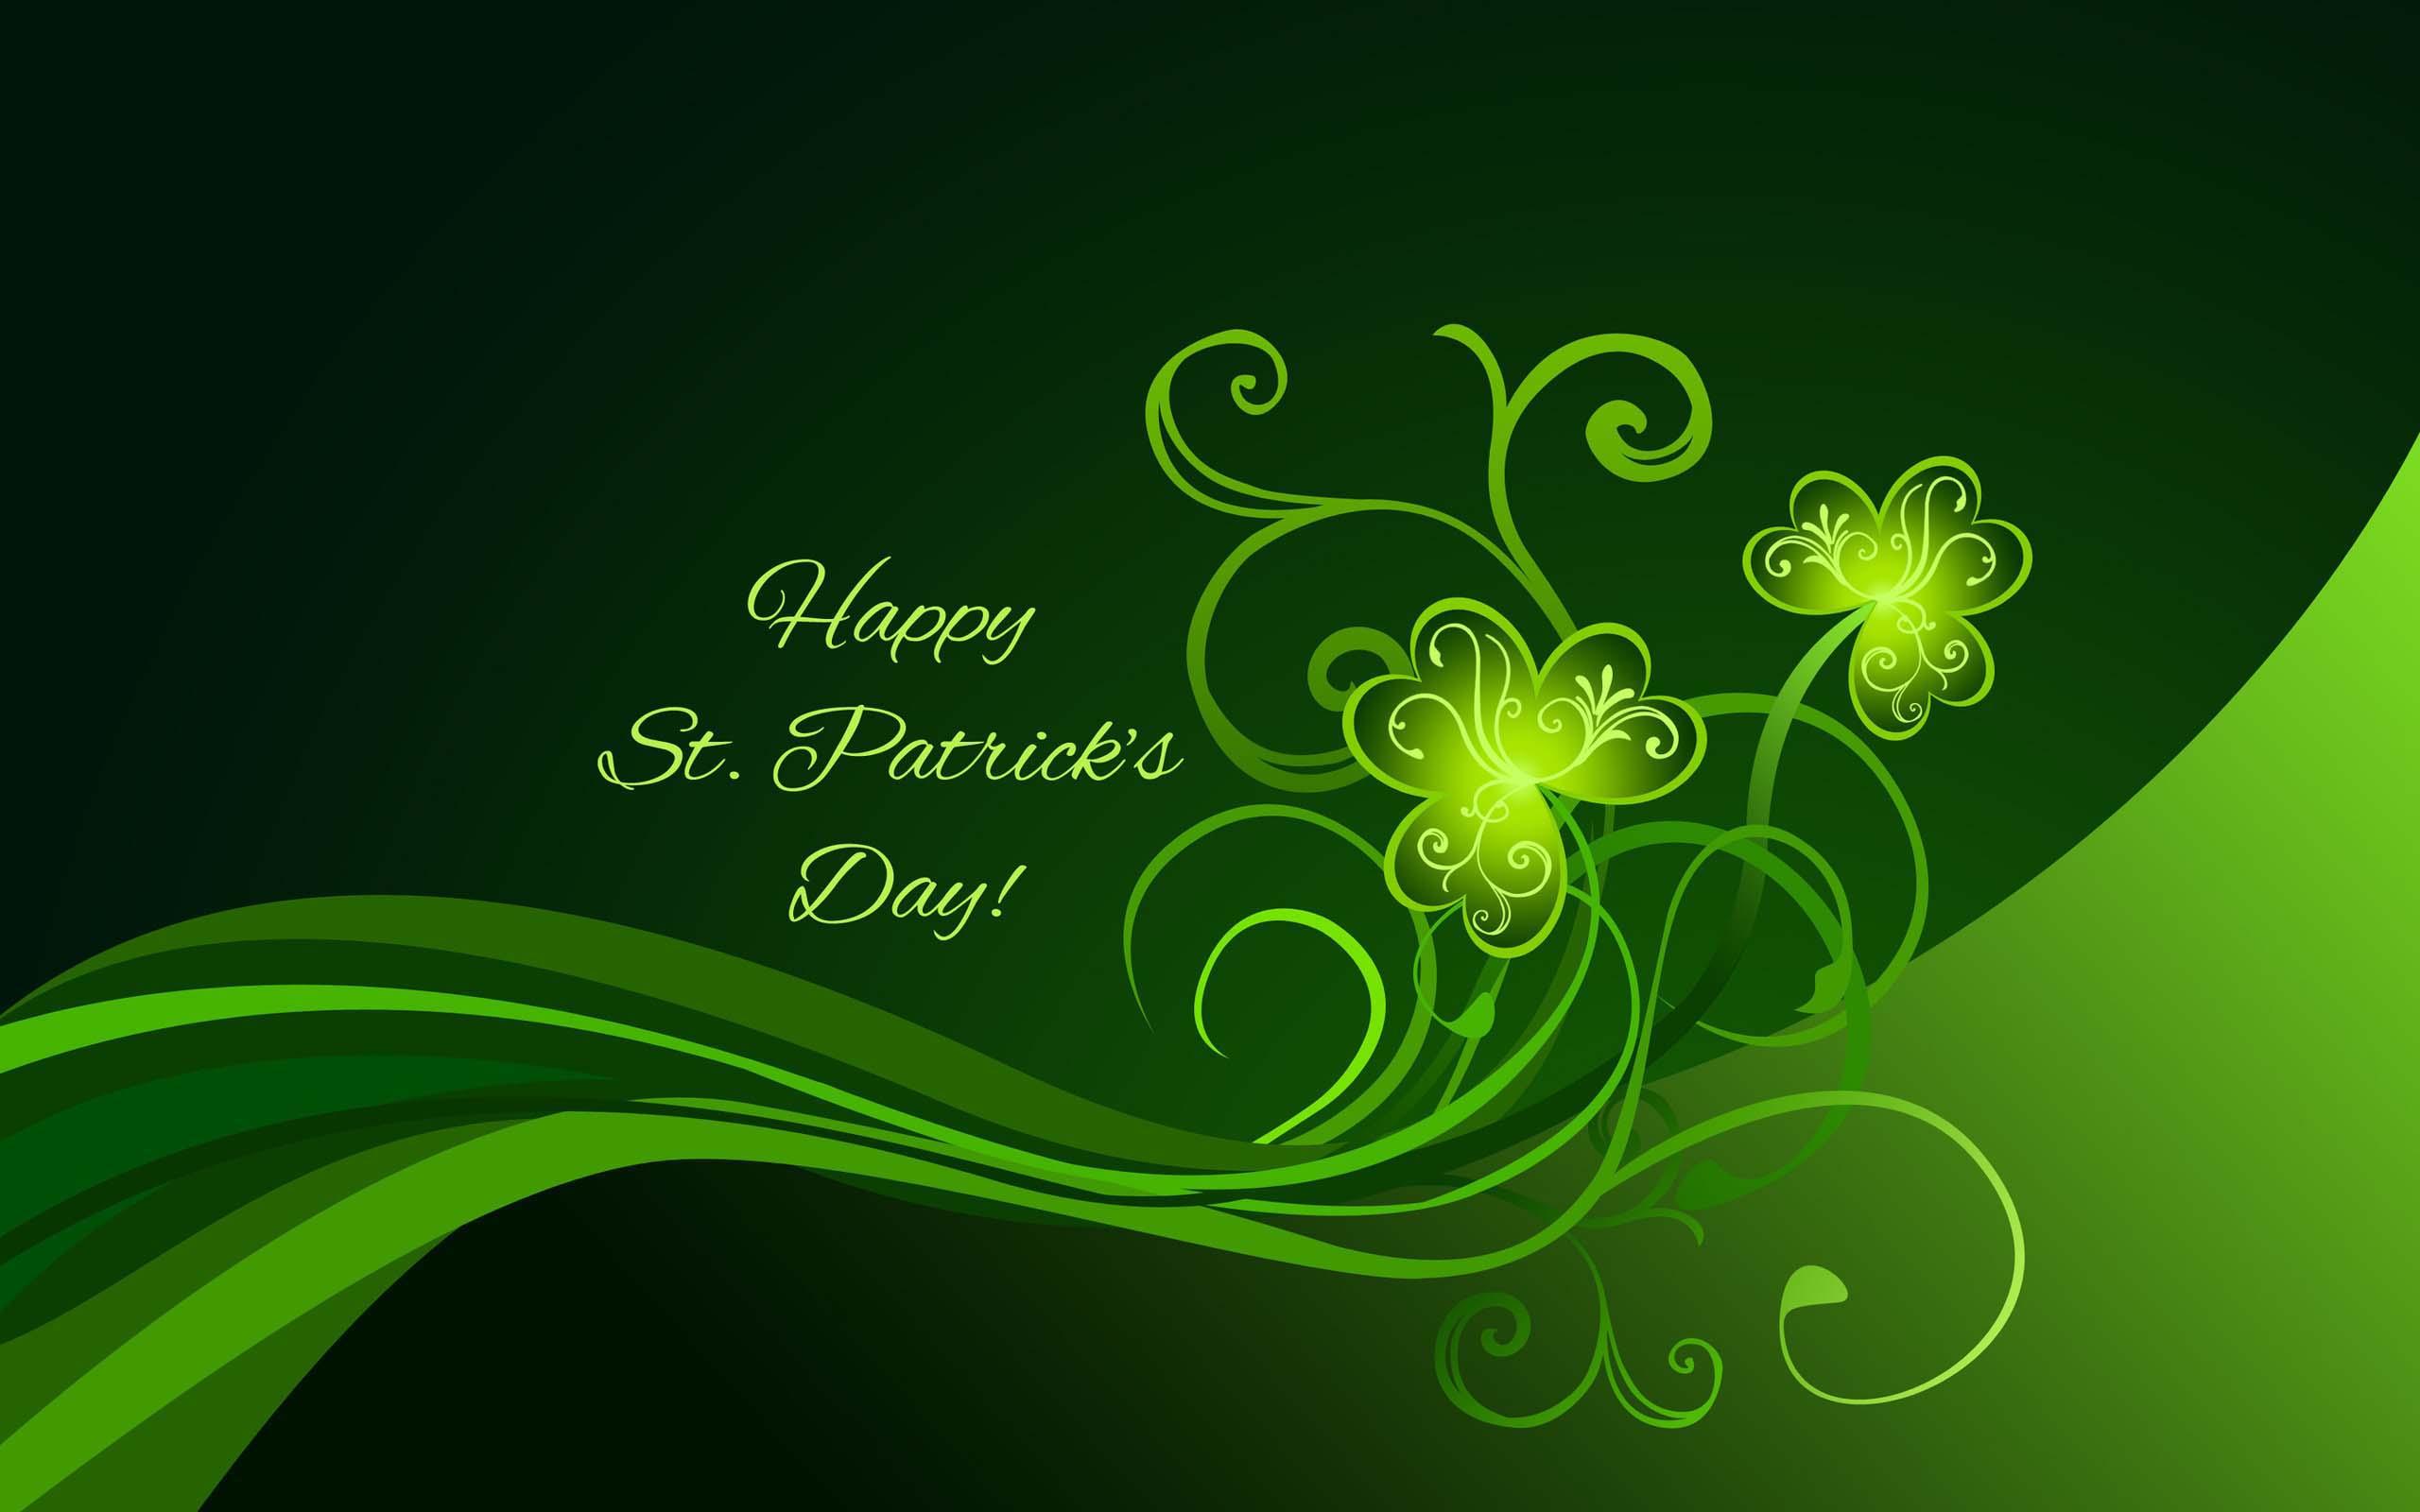 St. Patrick's Day HD Wallpaper   Wide Screen Wallpaper ...